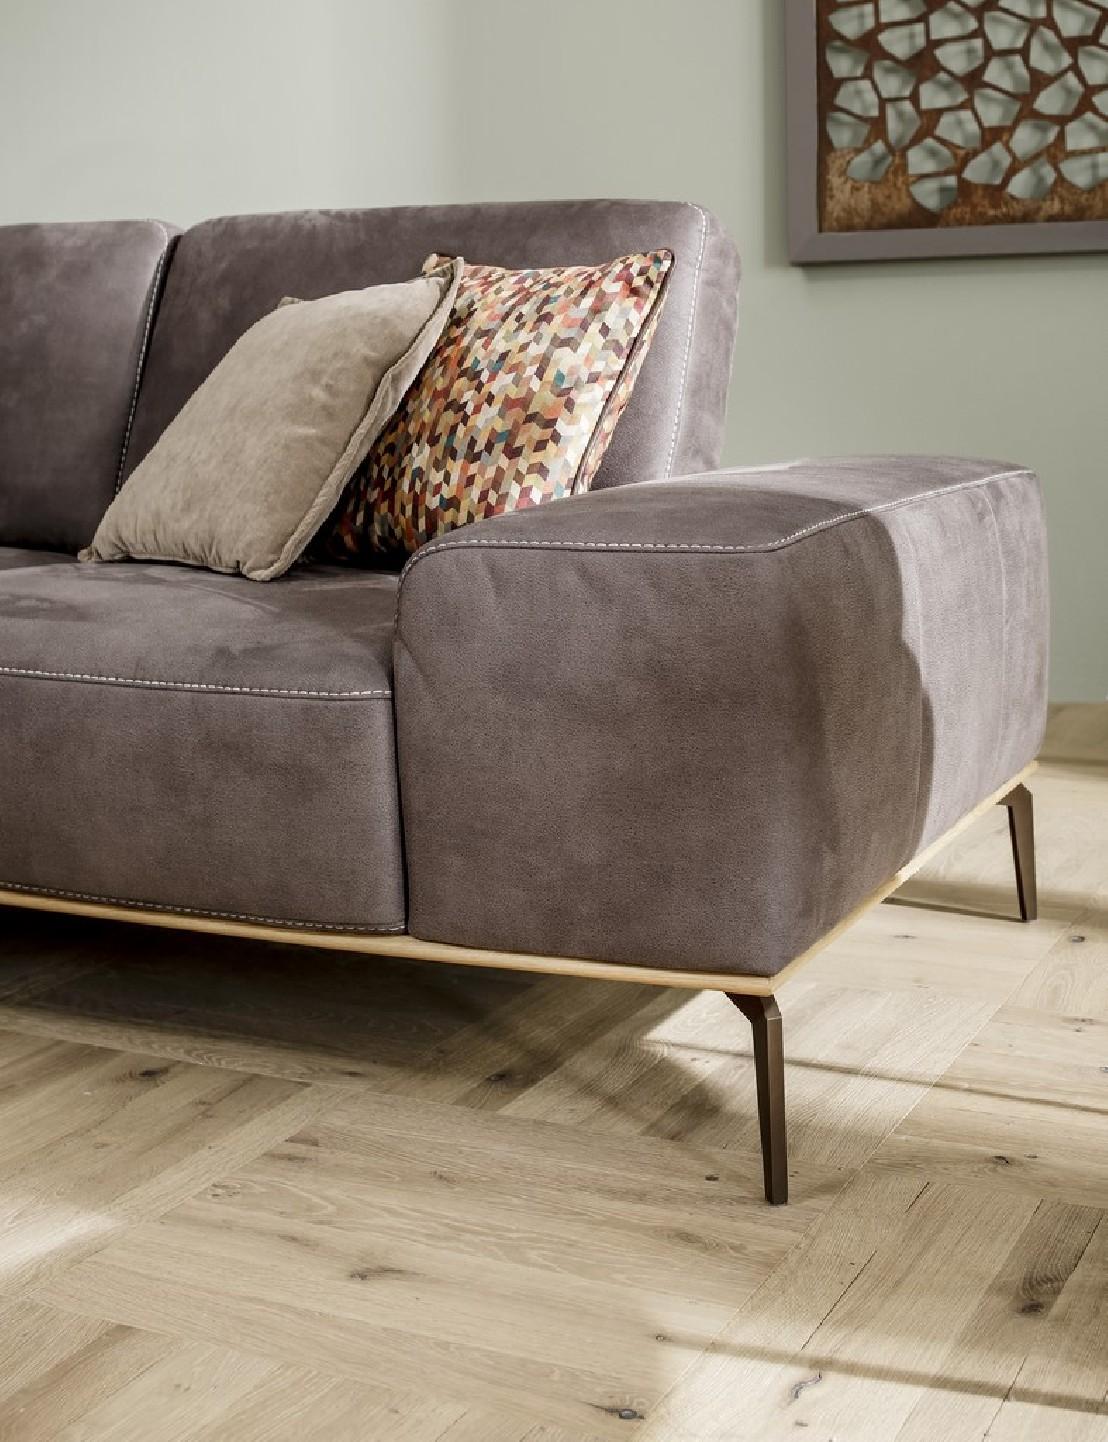 canap cuir angle design base bois little prince. Black Bedroom Furniture Sets. Home Design Ideas